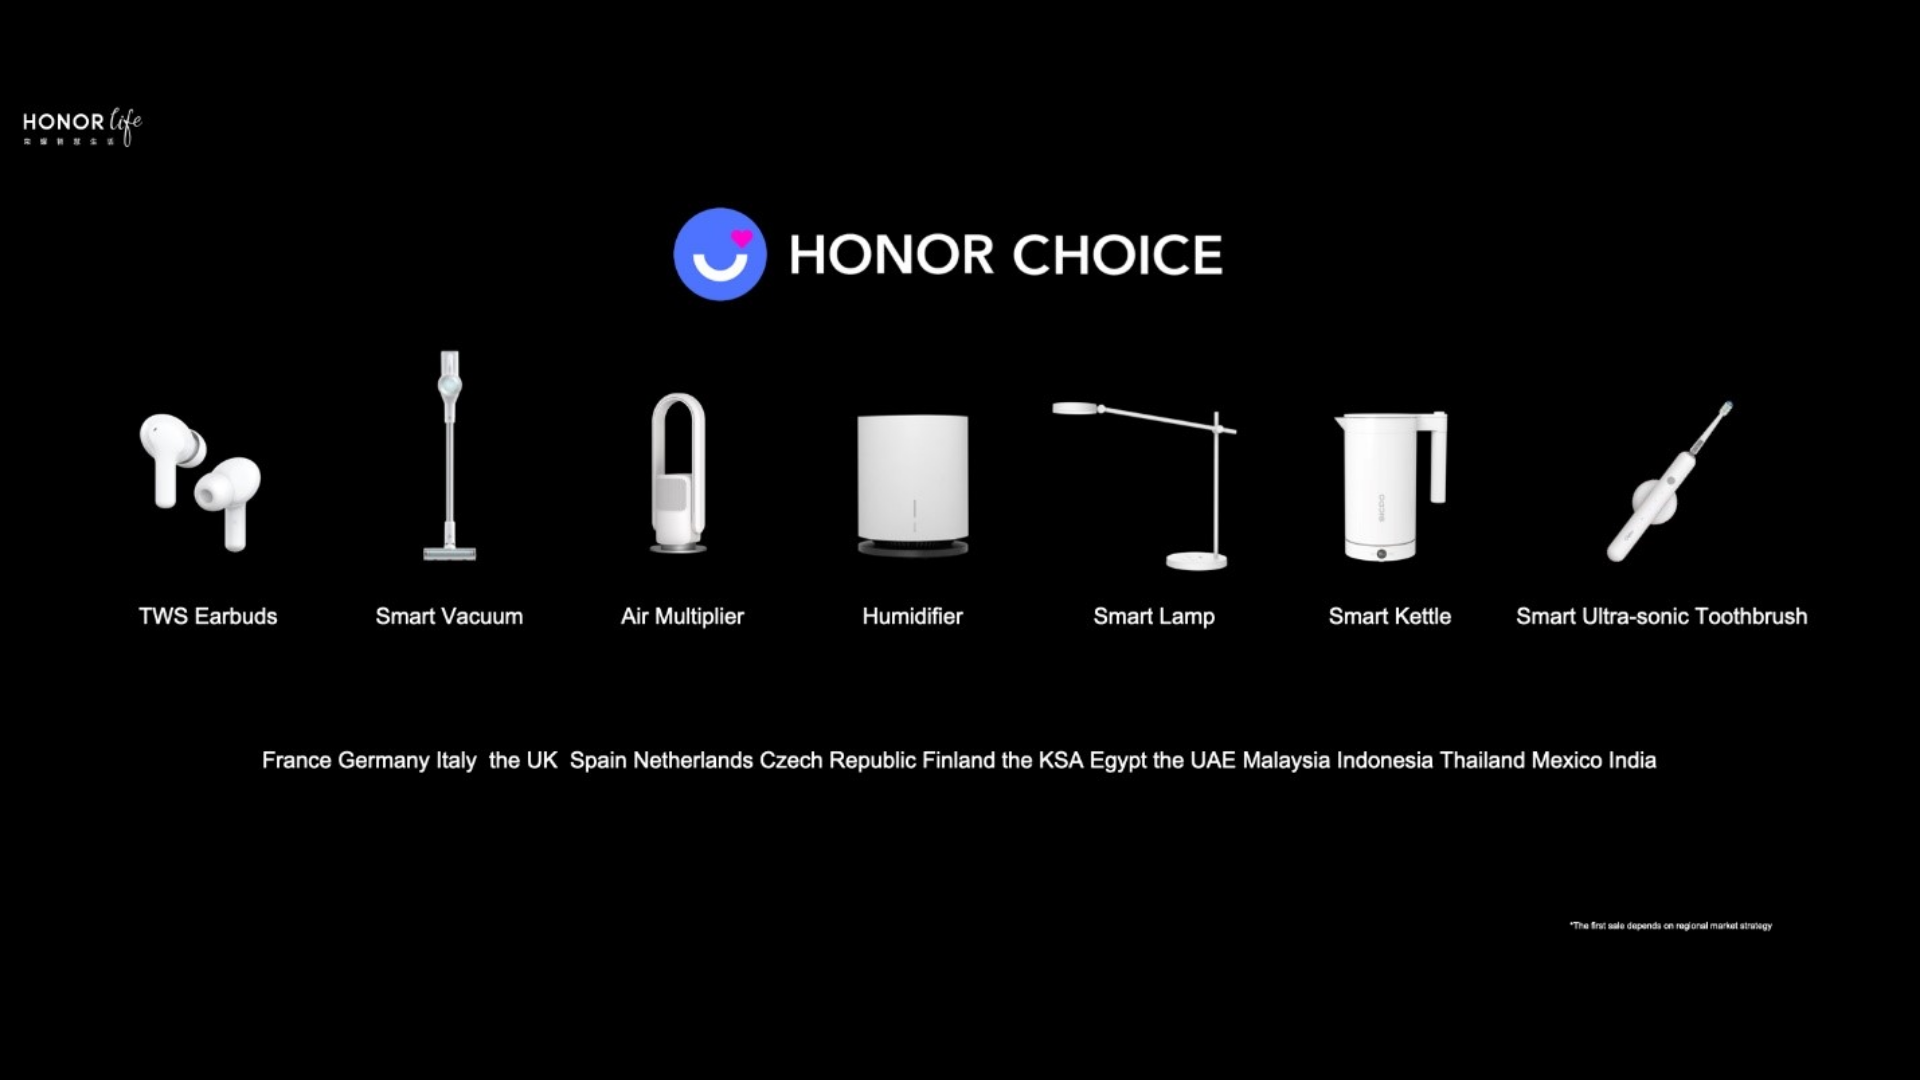 Honor Choice TWS earbuds